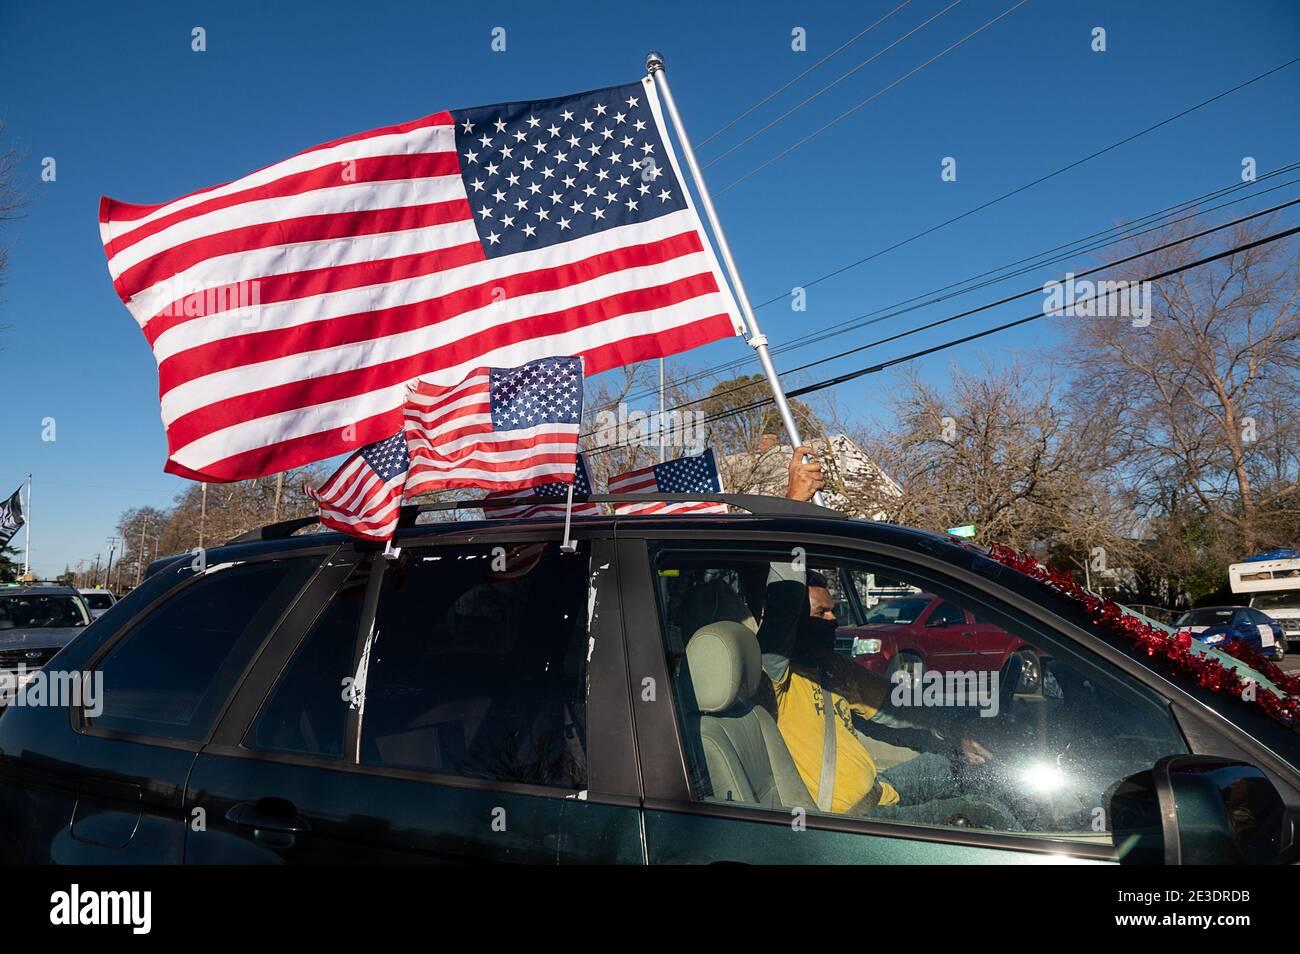 Sacramento, CA, USA. 18th Jan, 2021. 100's of cars participated in the Black Lives Sacramento and NCAAP #ReclaimMLK Day car caravan in celebration of Martin Luther King Jr birthday  Monday, Jan. 18, 2021 in Sacramento. Credit: Paul Kitagaki Jr./ZUMA Wire/Alamy Live News Stock Photo